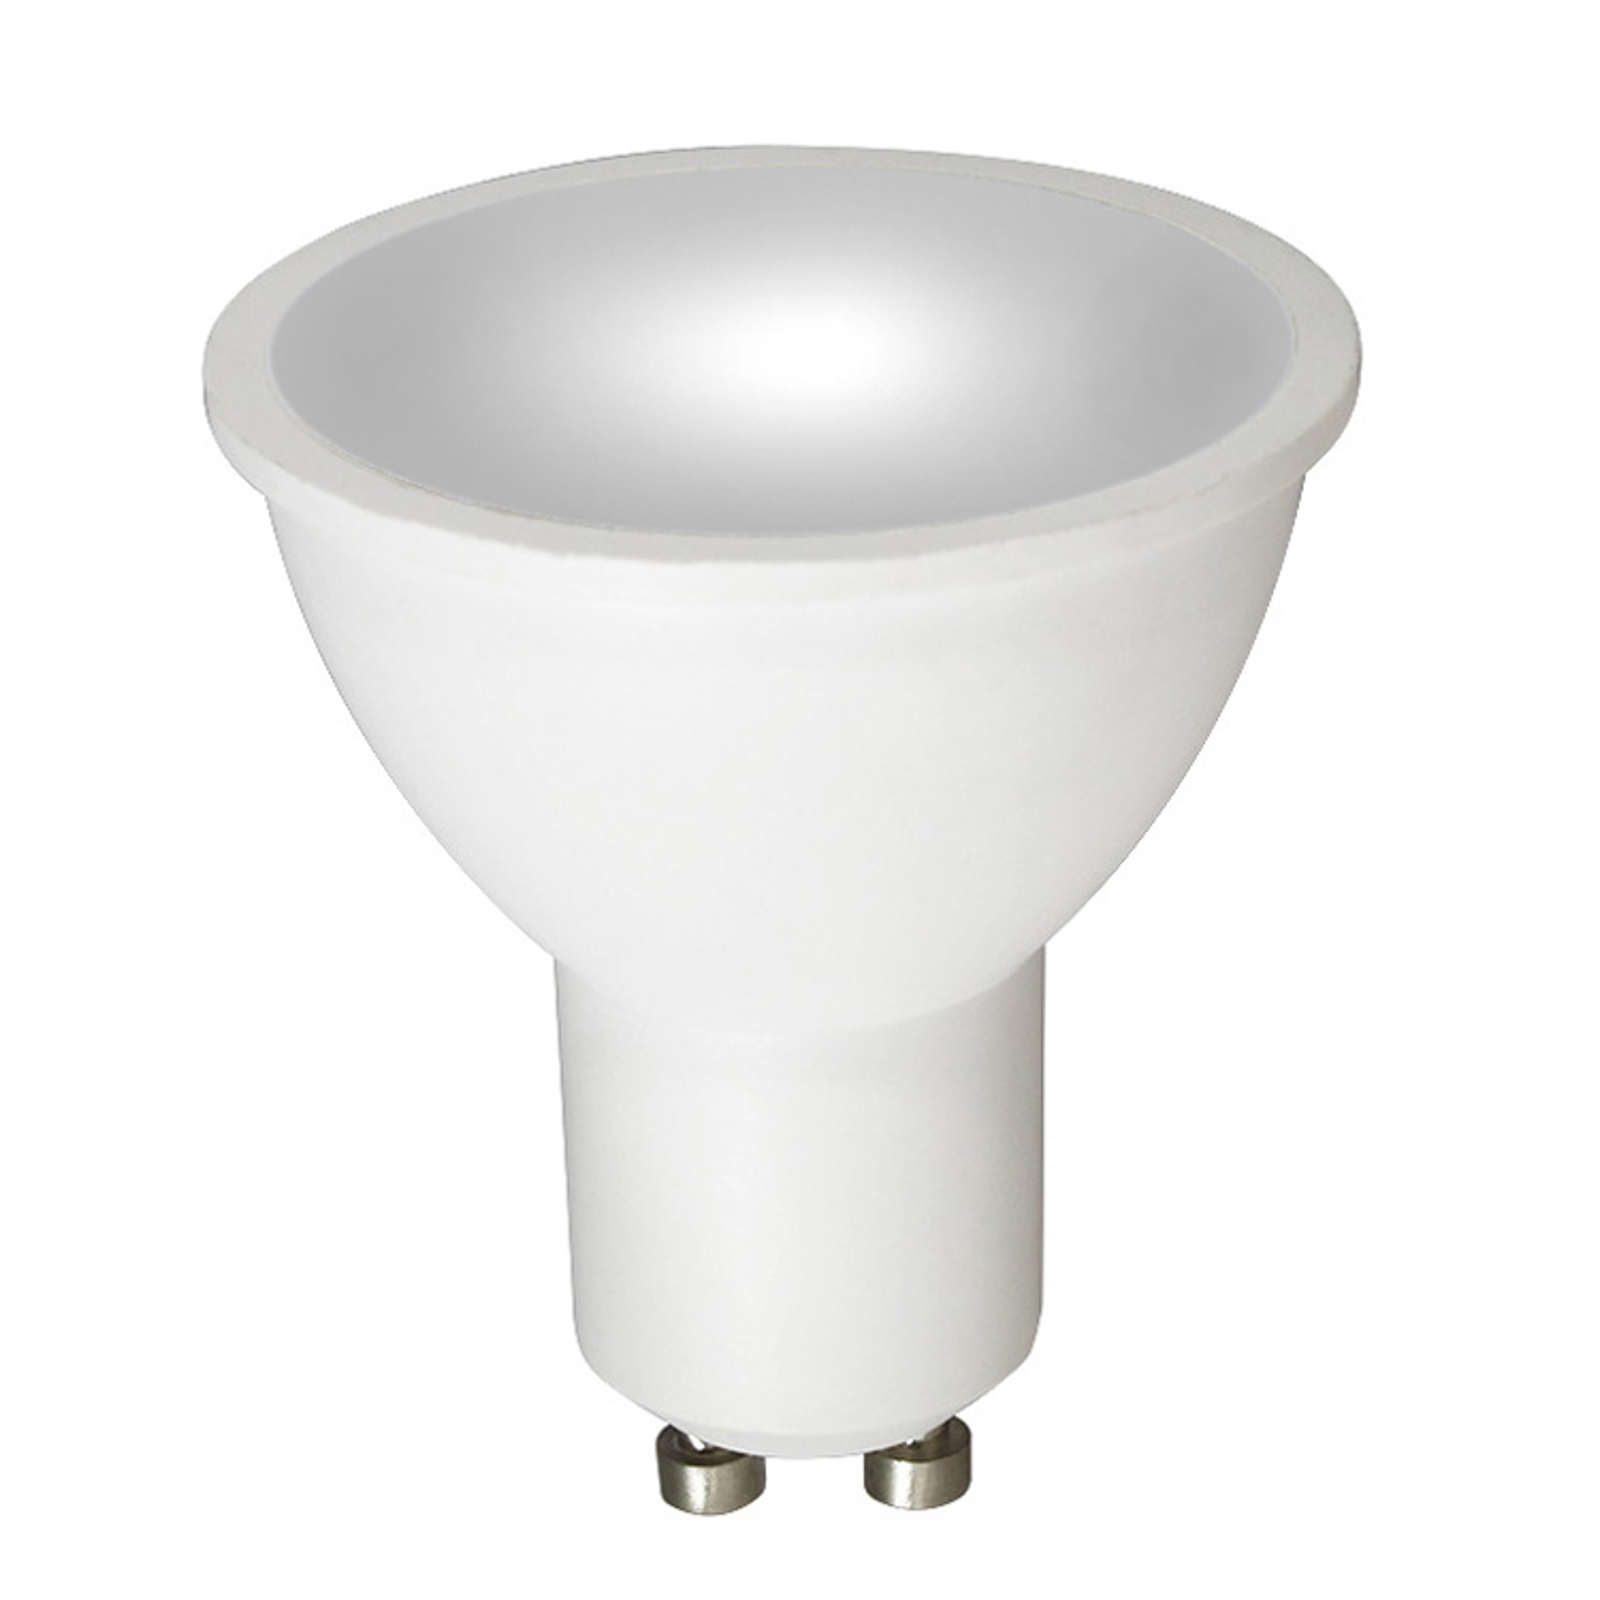 LED-Reflektor KADO GU10 7,5W 120° 4.000K